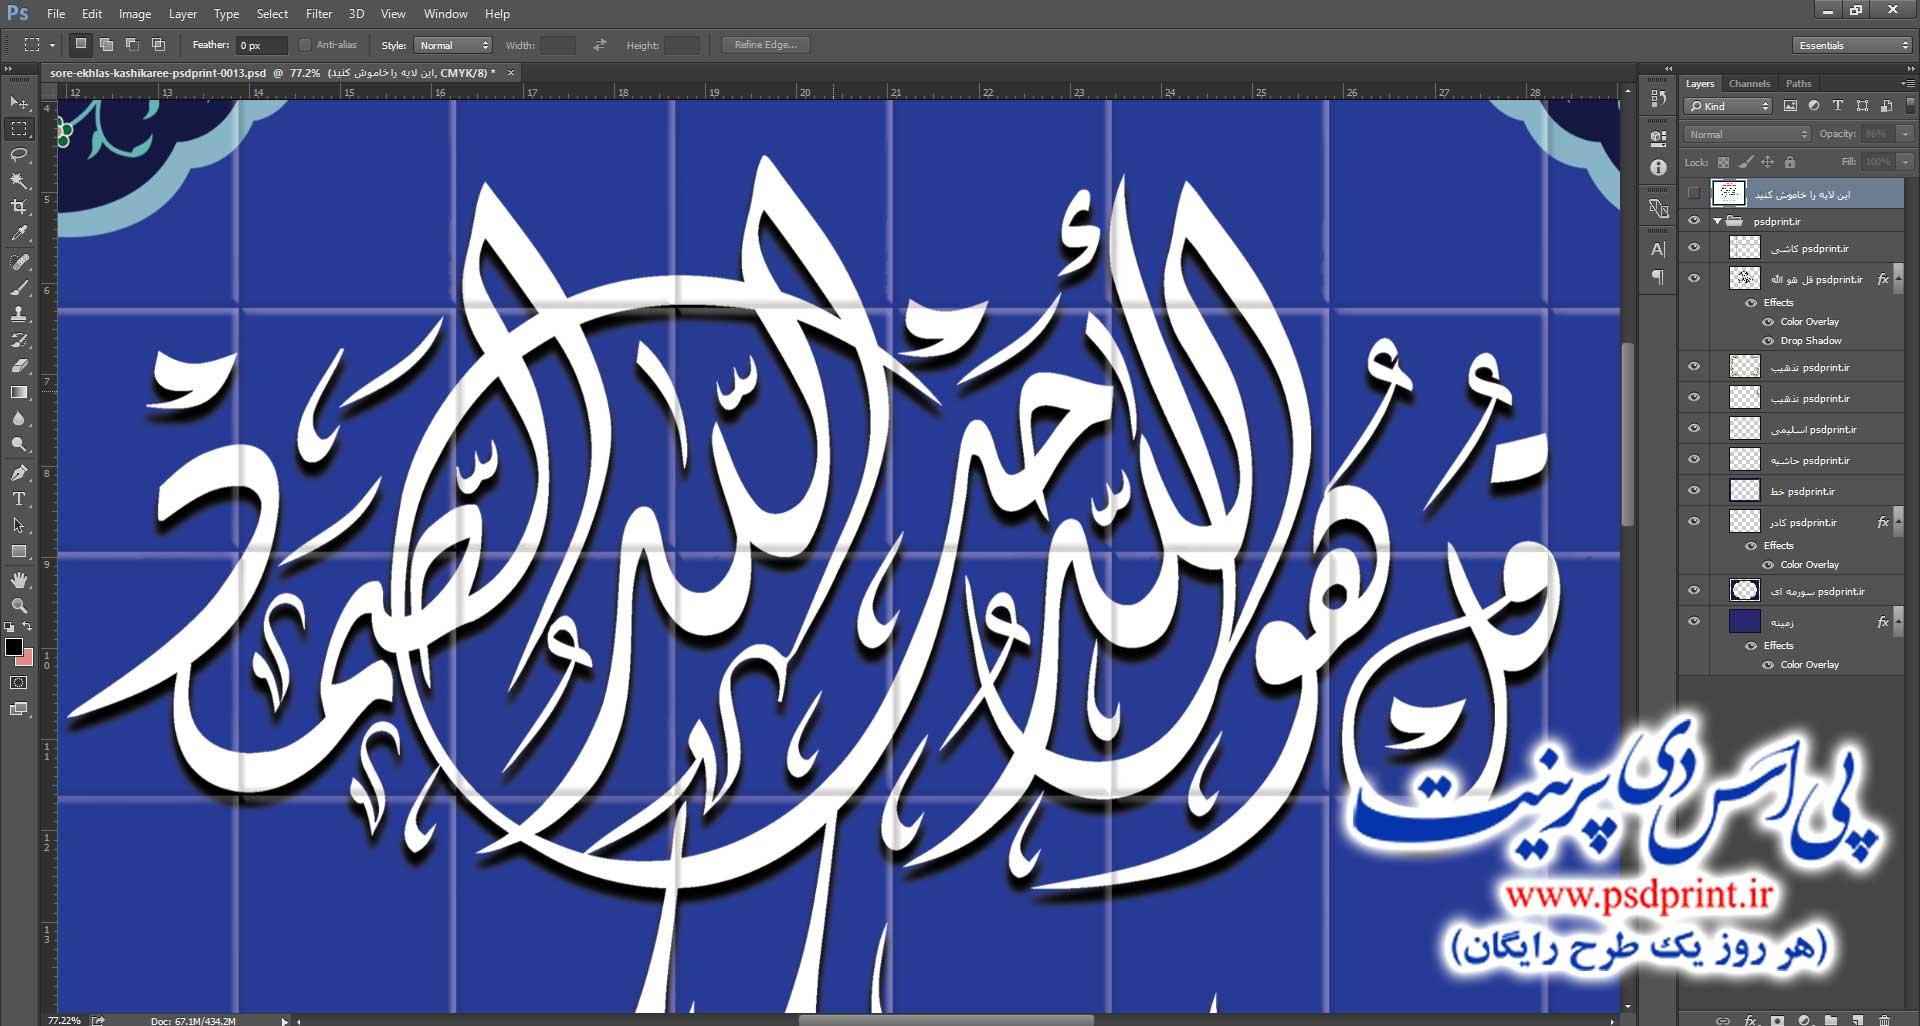 کاشی کاری قل هو الله احد